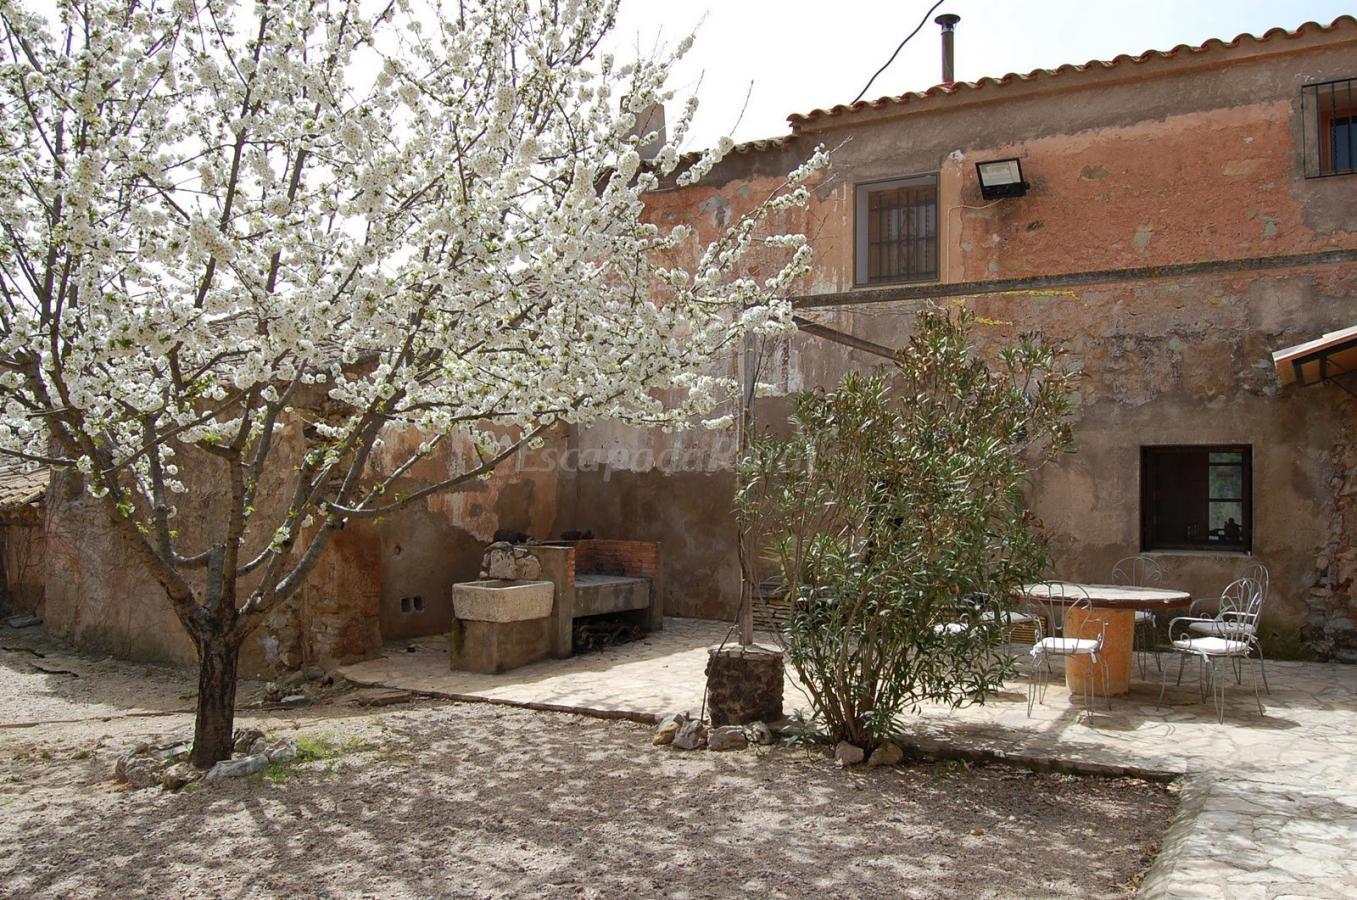 Fotos de casa rural casas de alcance casa de campo - Casas de campo en valencia ...